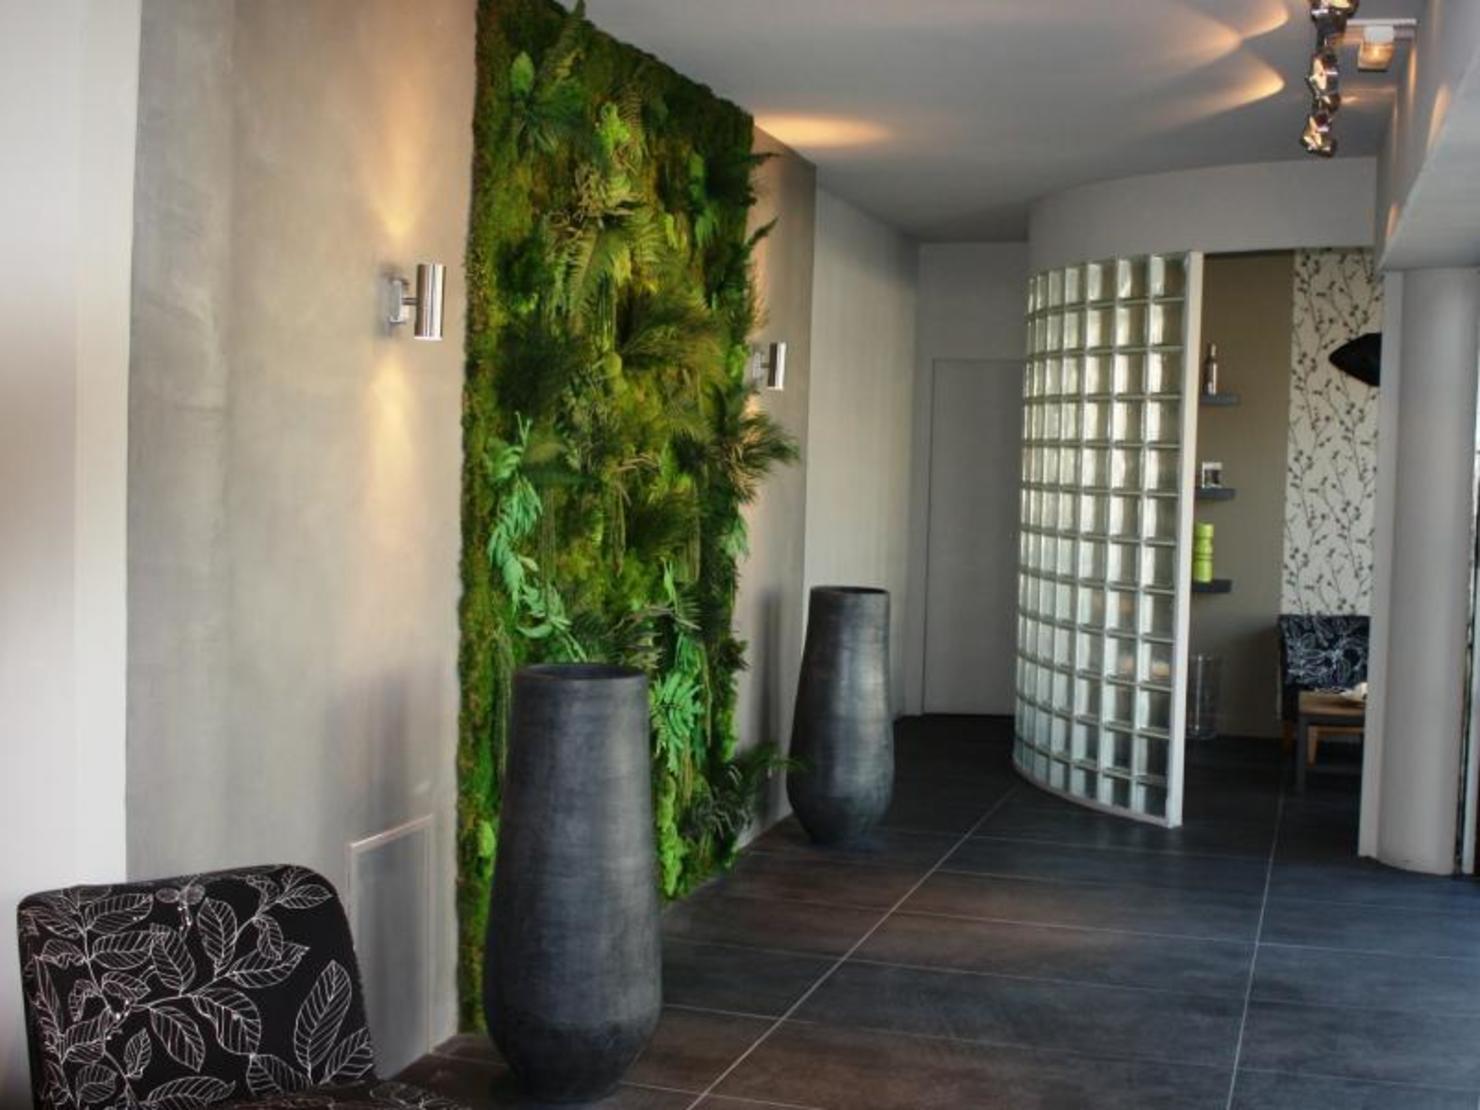 deltaccord c t mer marseille tarifs avis horaires essai gratuit. Black Bedroom Furniture Sets. Home Design Ideas